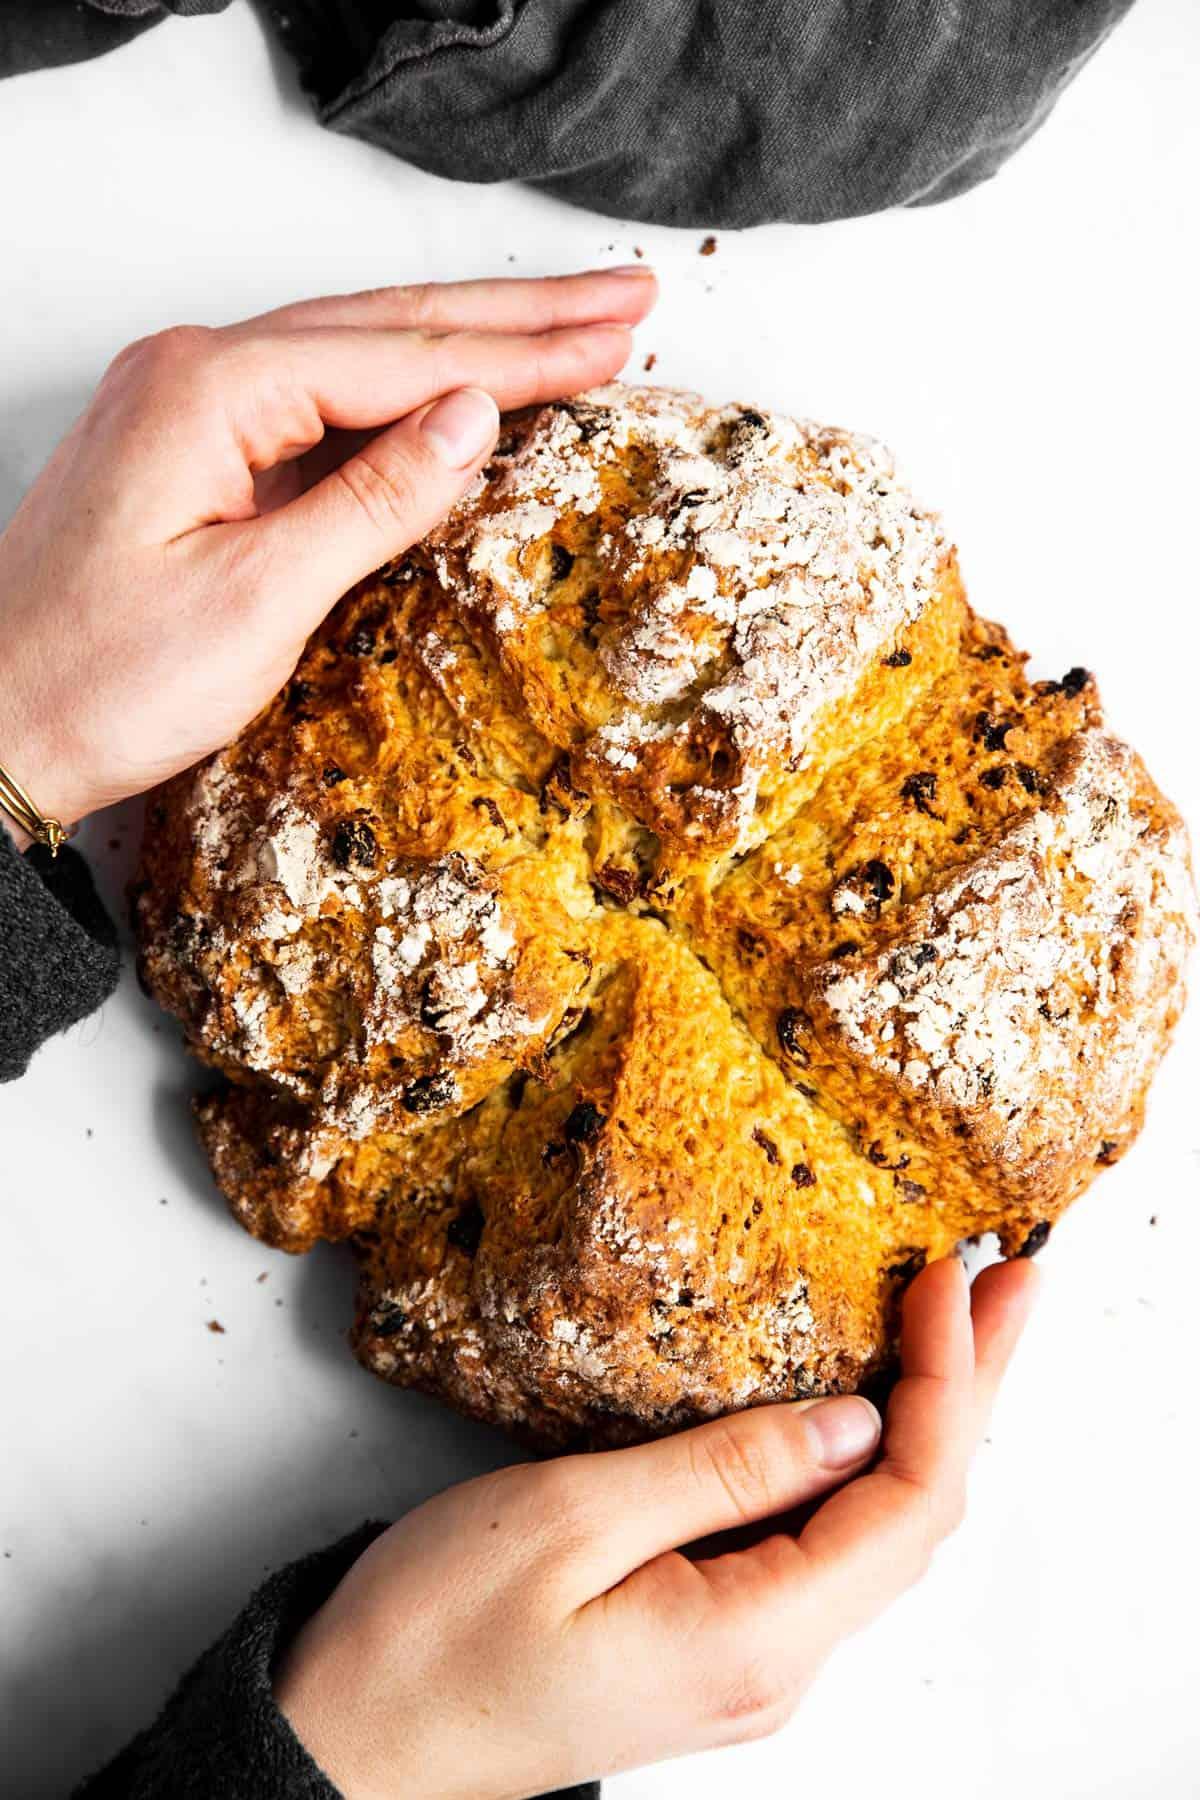 woman holding a loaf of Irish soda bread